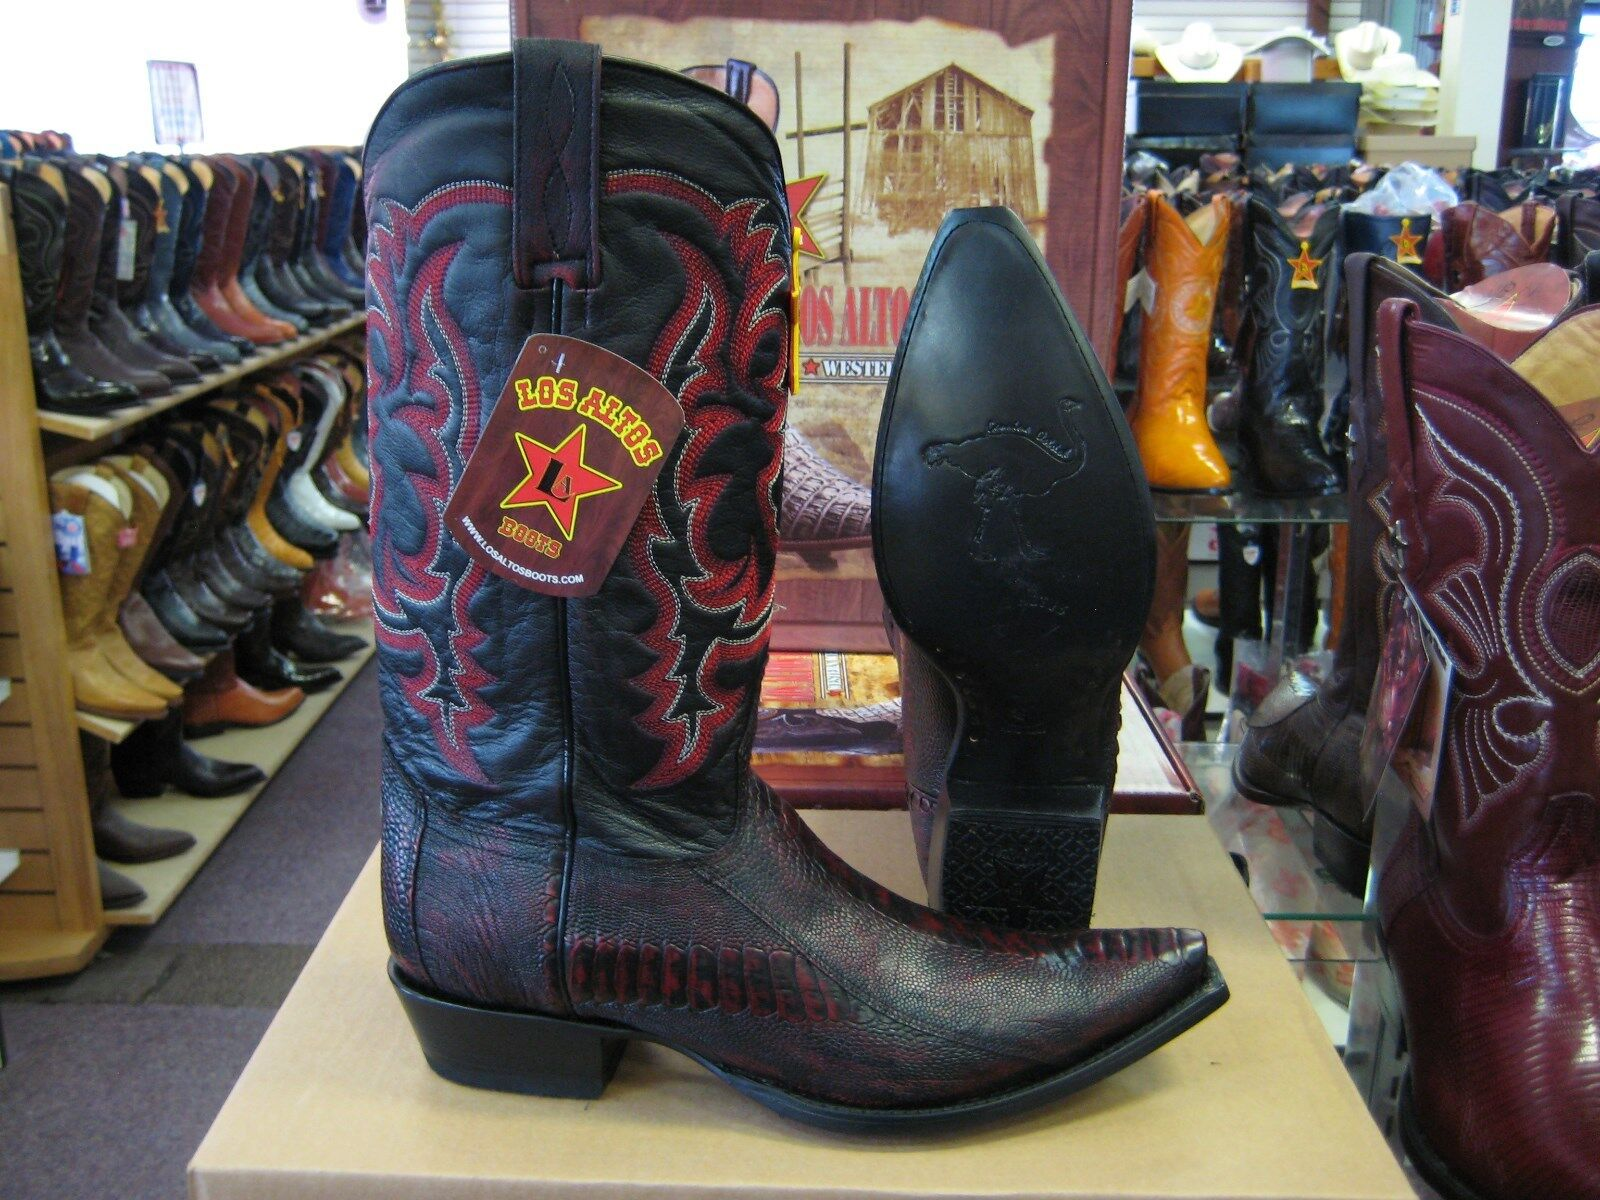 LOS ALTOS CHERRY GENUINE SNIP TOE OSTRICH LEG WESTERN COWBOY BOOT (EE+) 940518